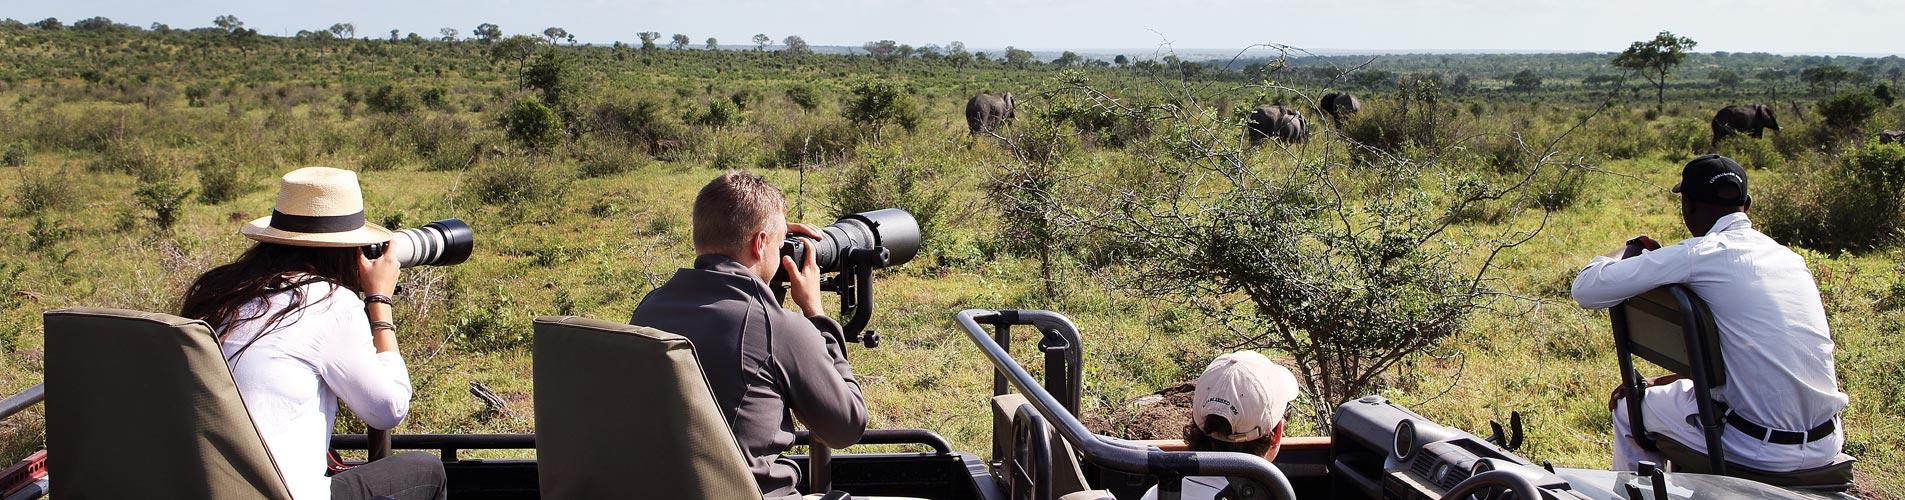 Photographic Safari Workshops at Londolozi